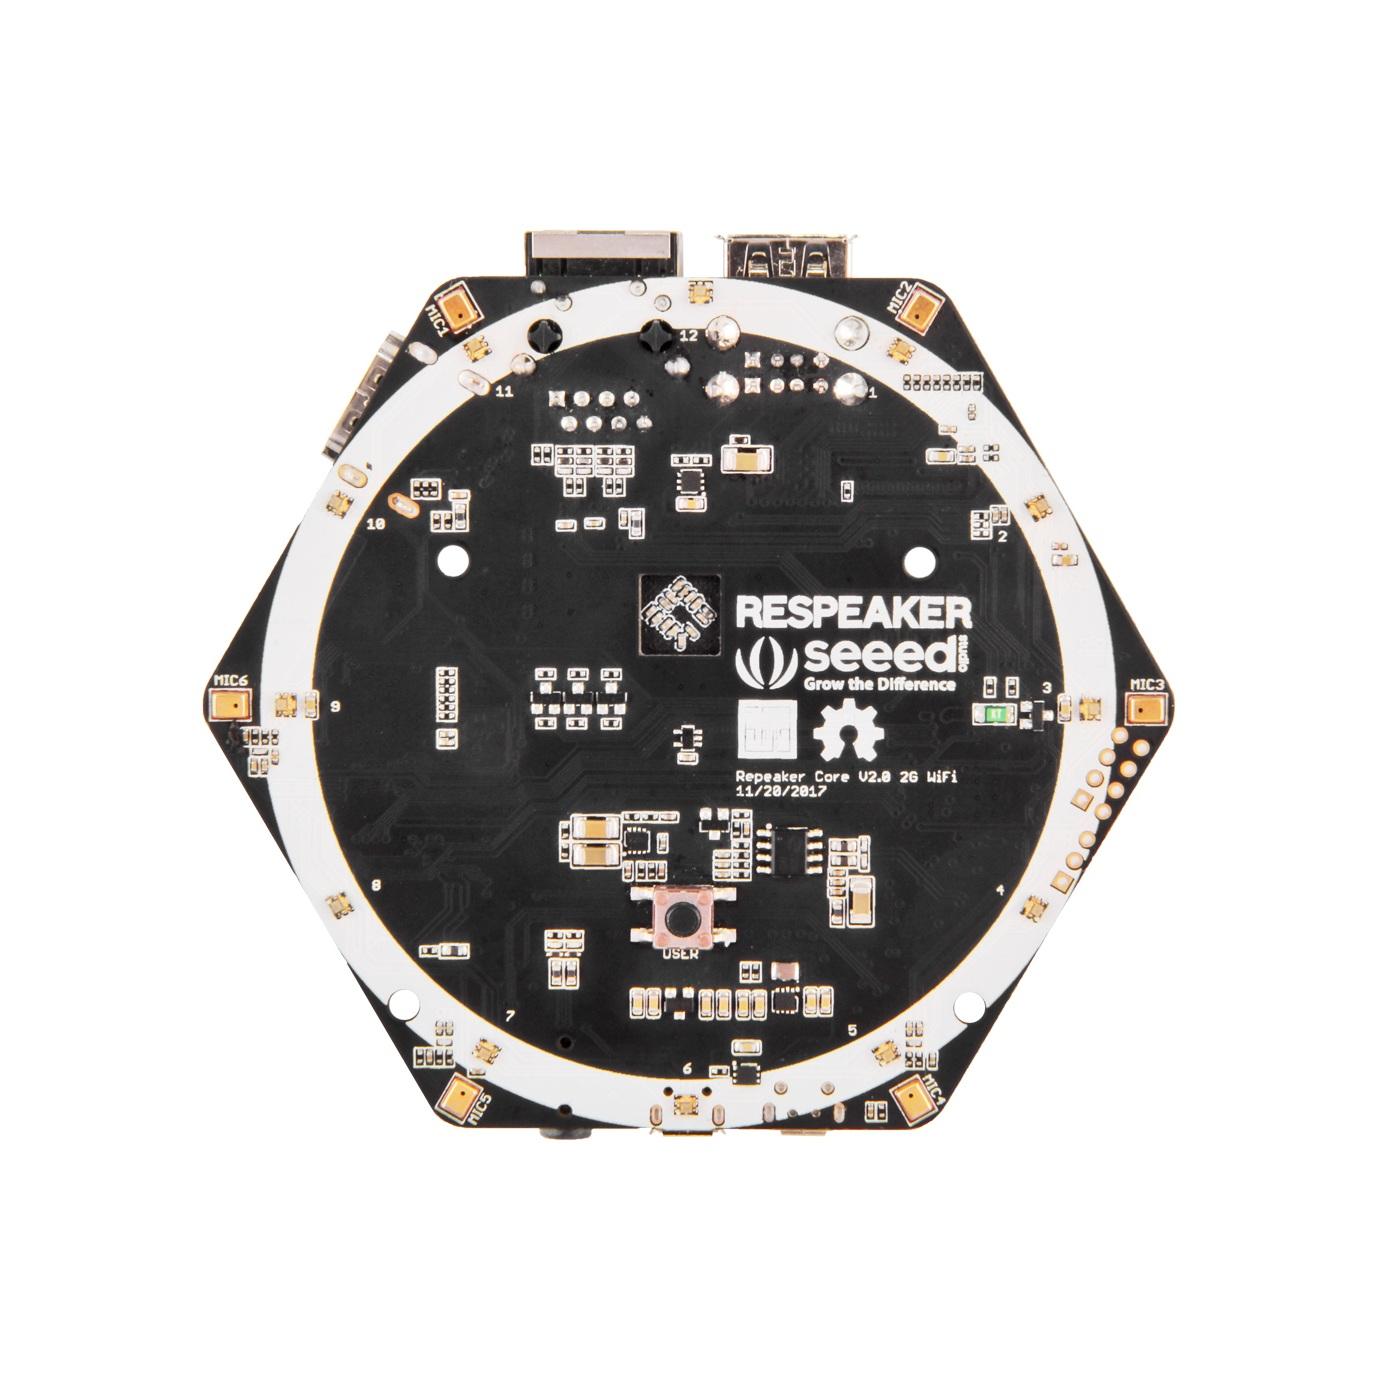 board-respeaker-core-v2-seeed-mach-nhan-dang-giong-noi